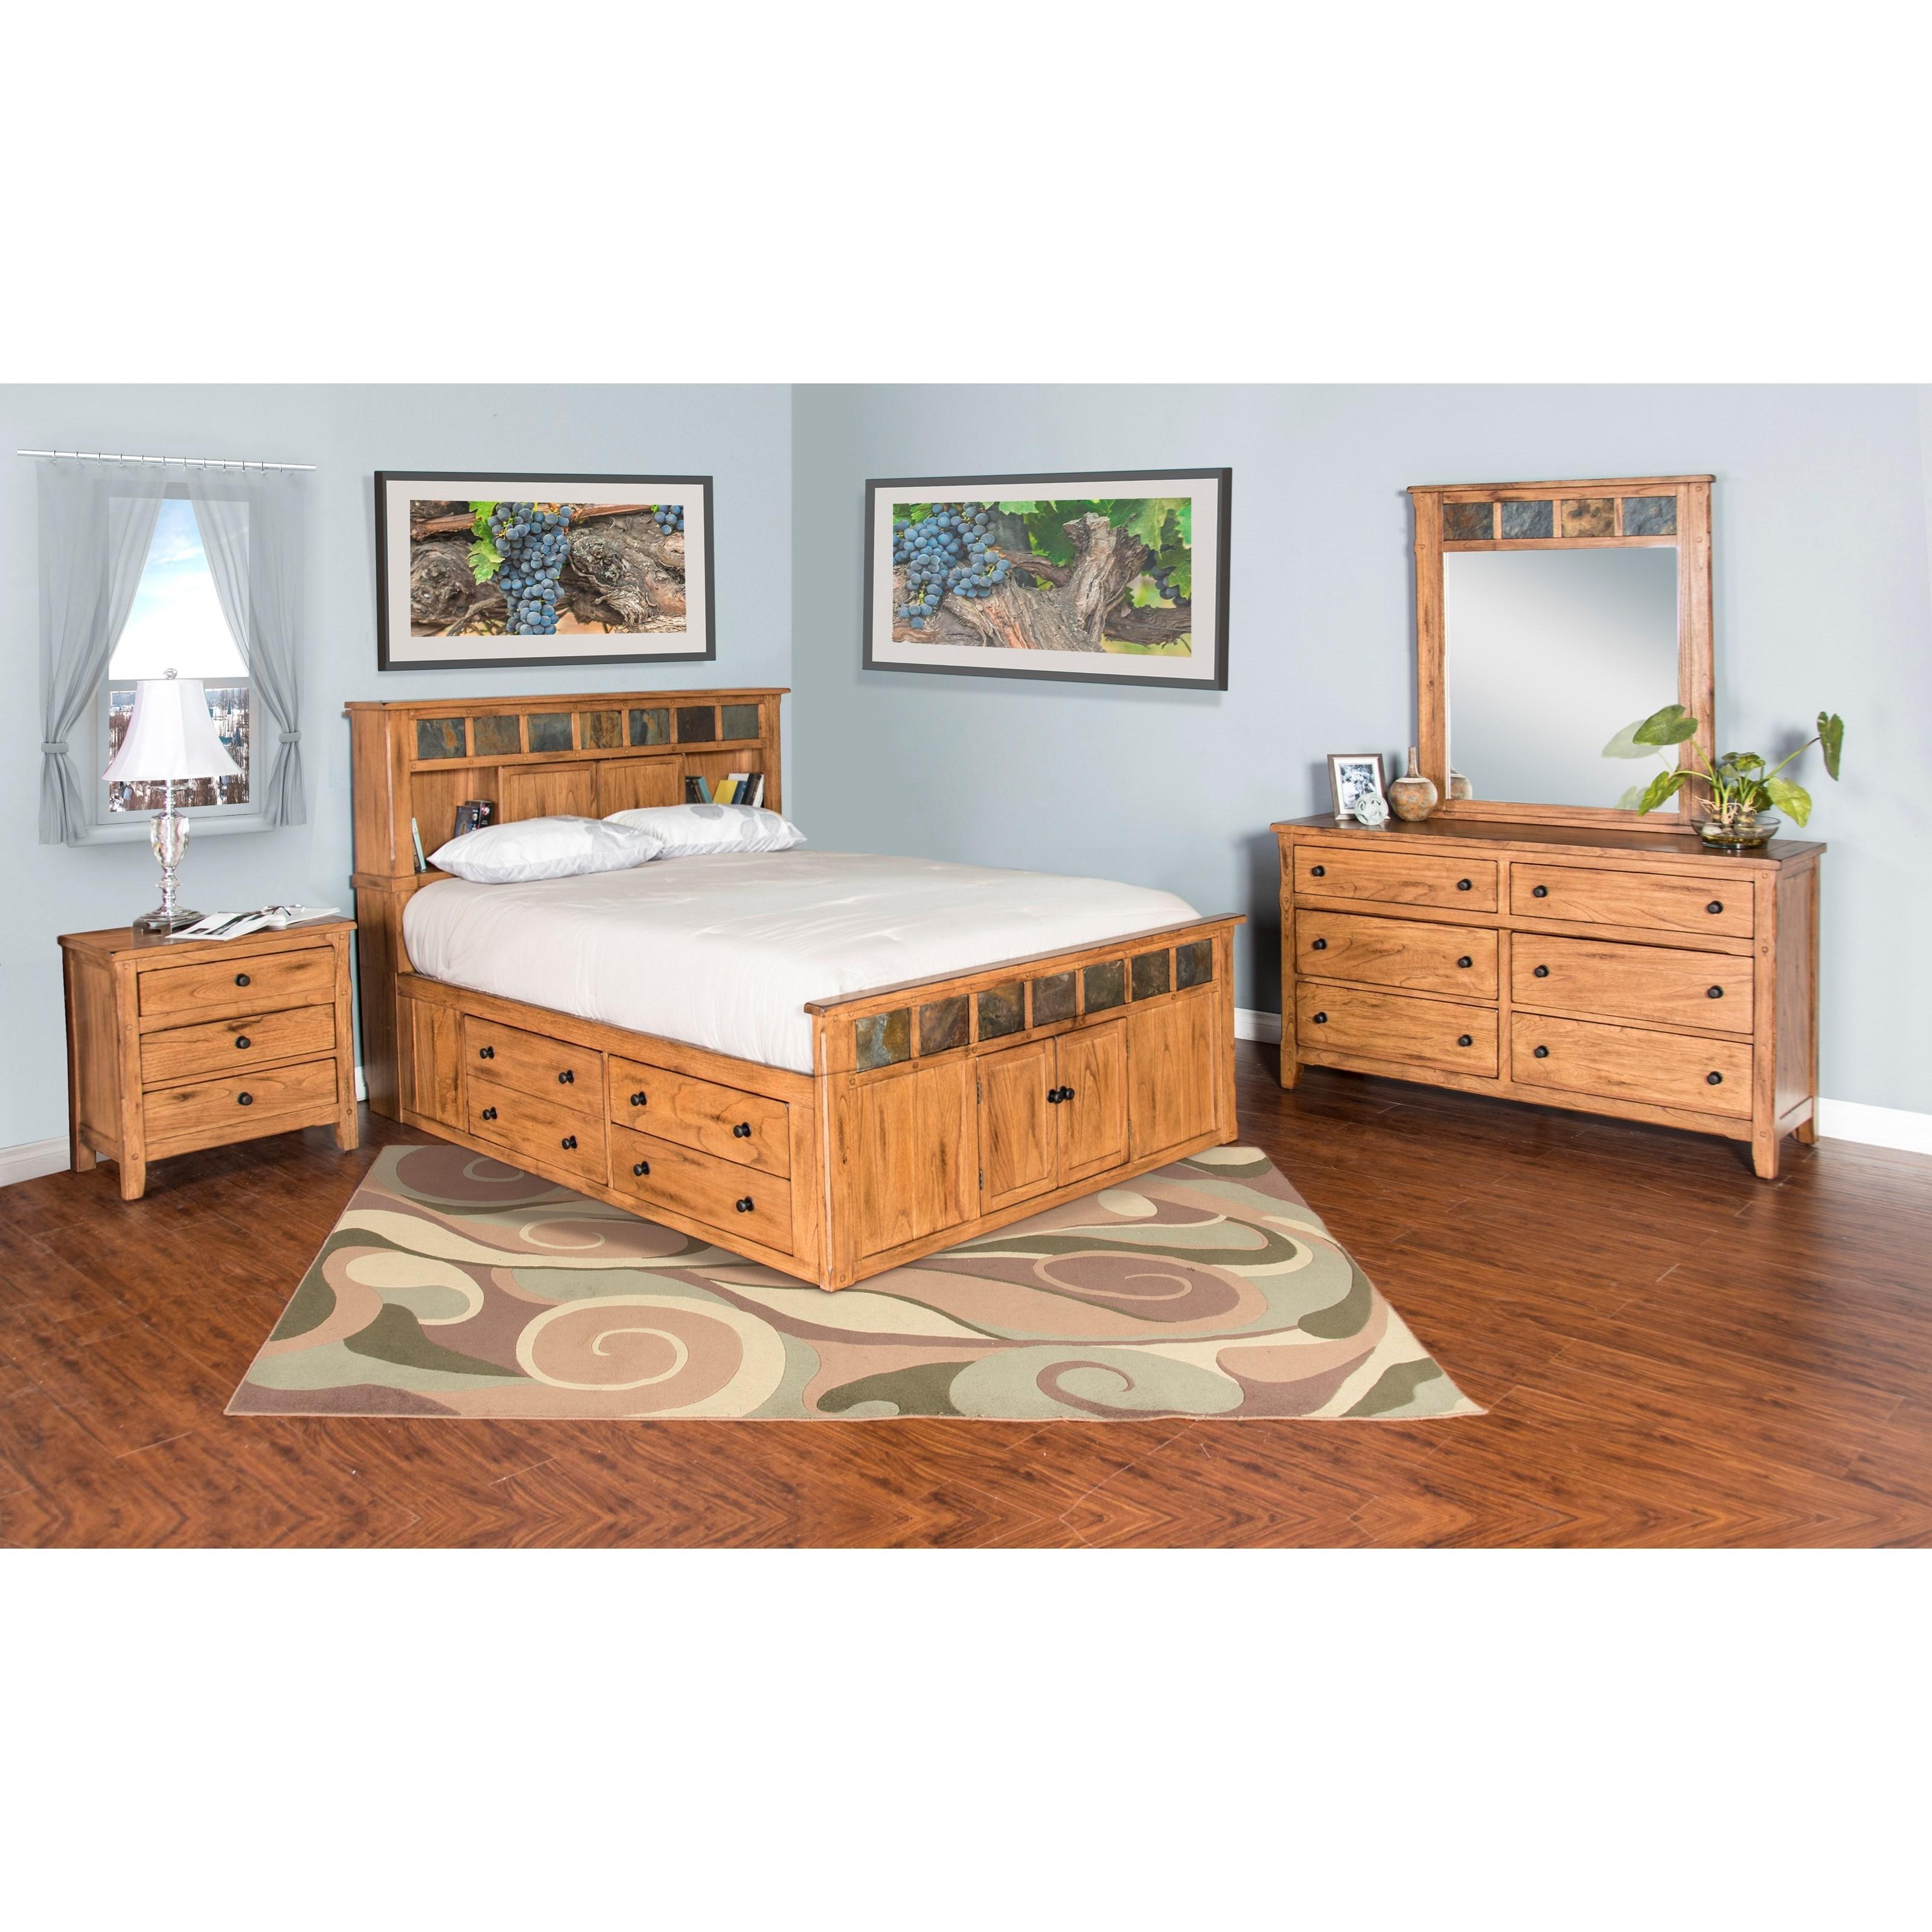 Sunny designs sedona king bedroom group fashion furniture bedroom groups for Sunny designs bedroom furniture